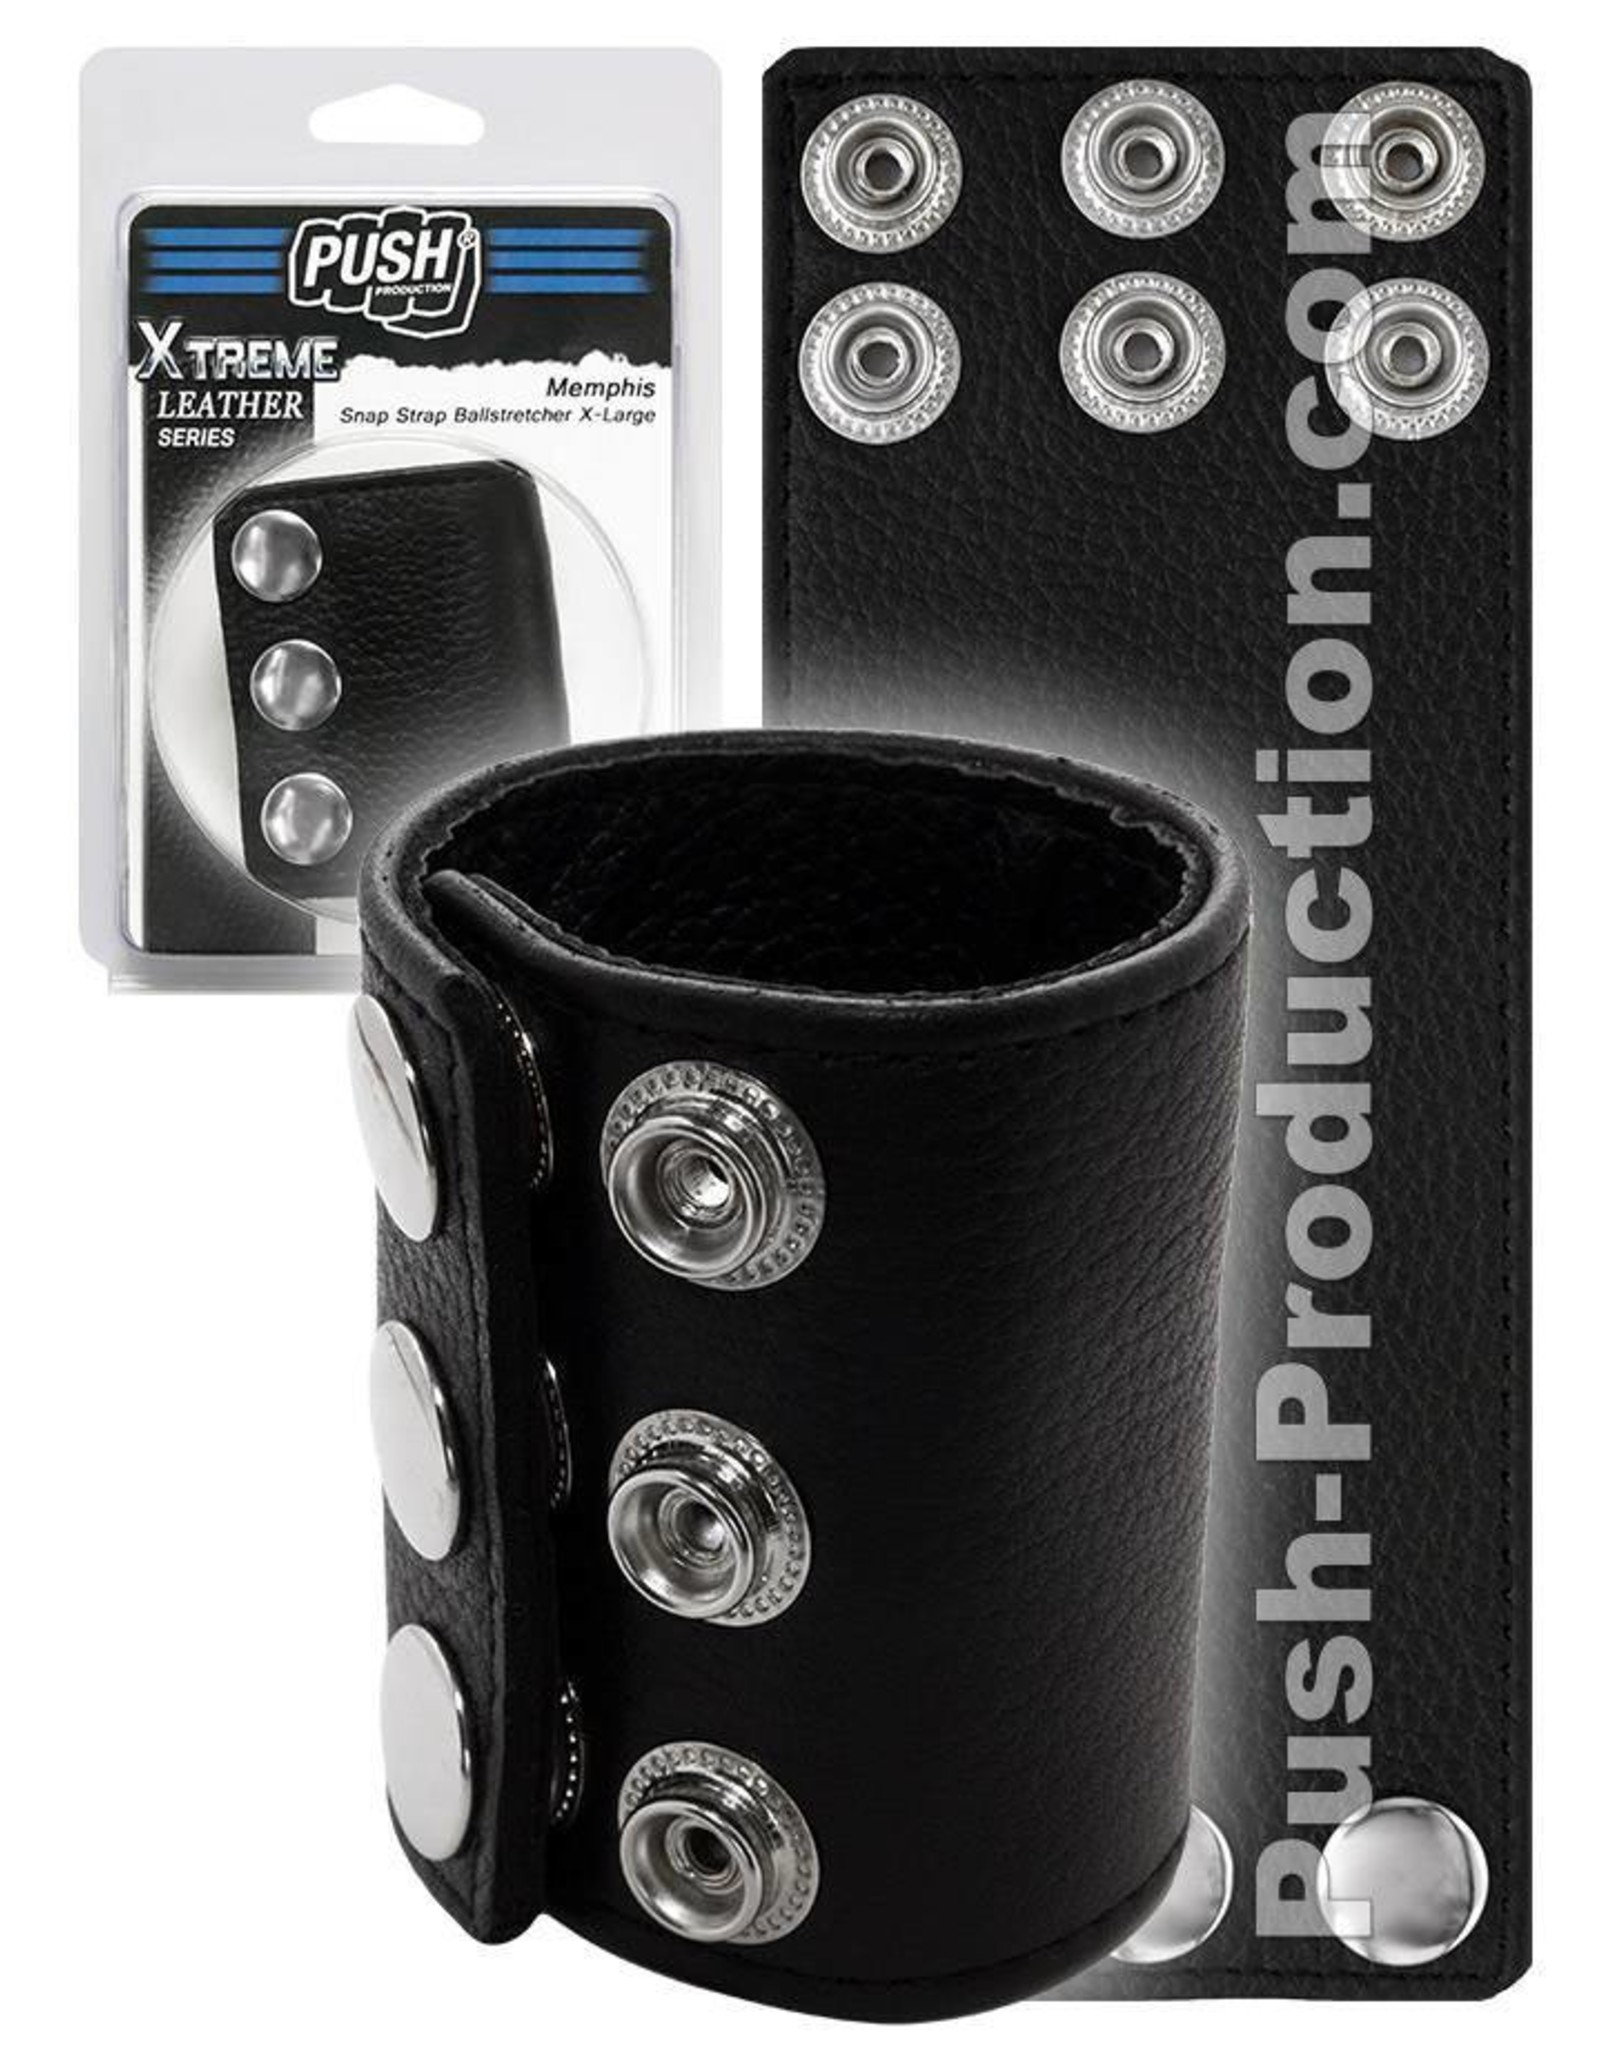 Push Xtreme Leather Memphis Snap Strap Ballstretcher X-large